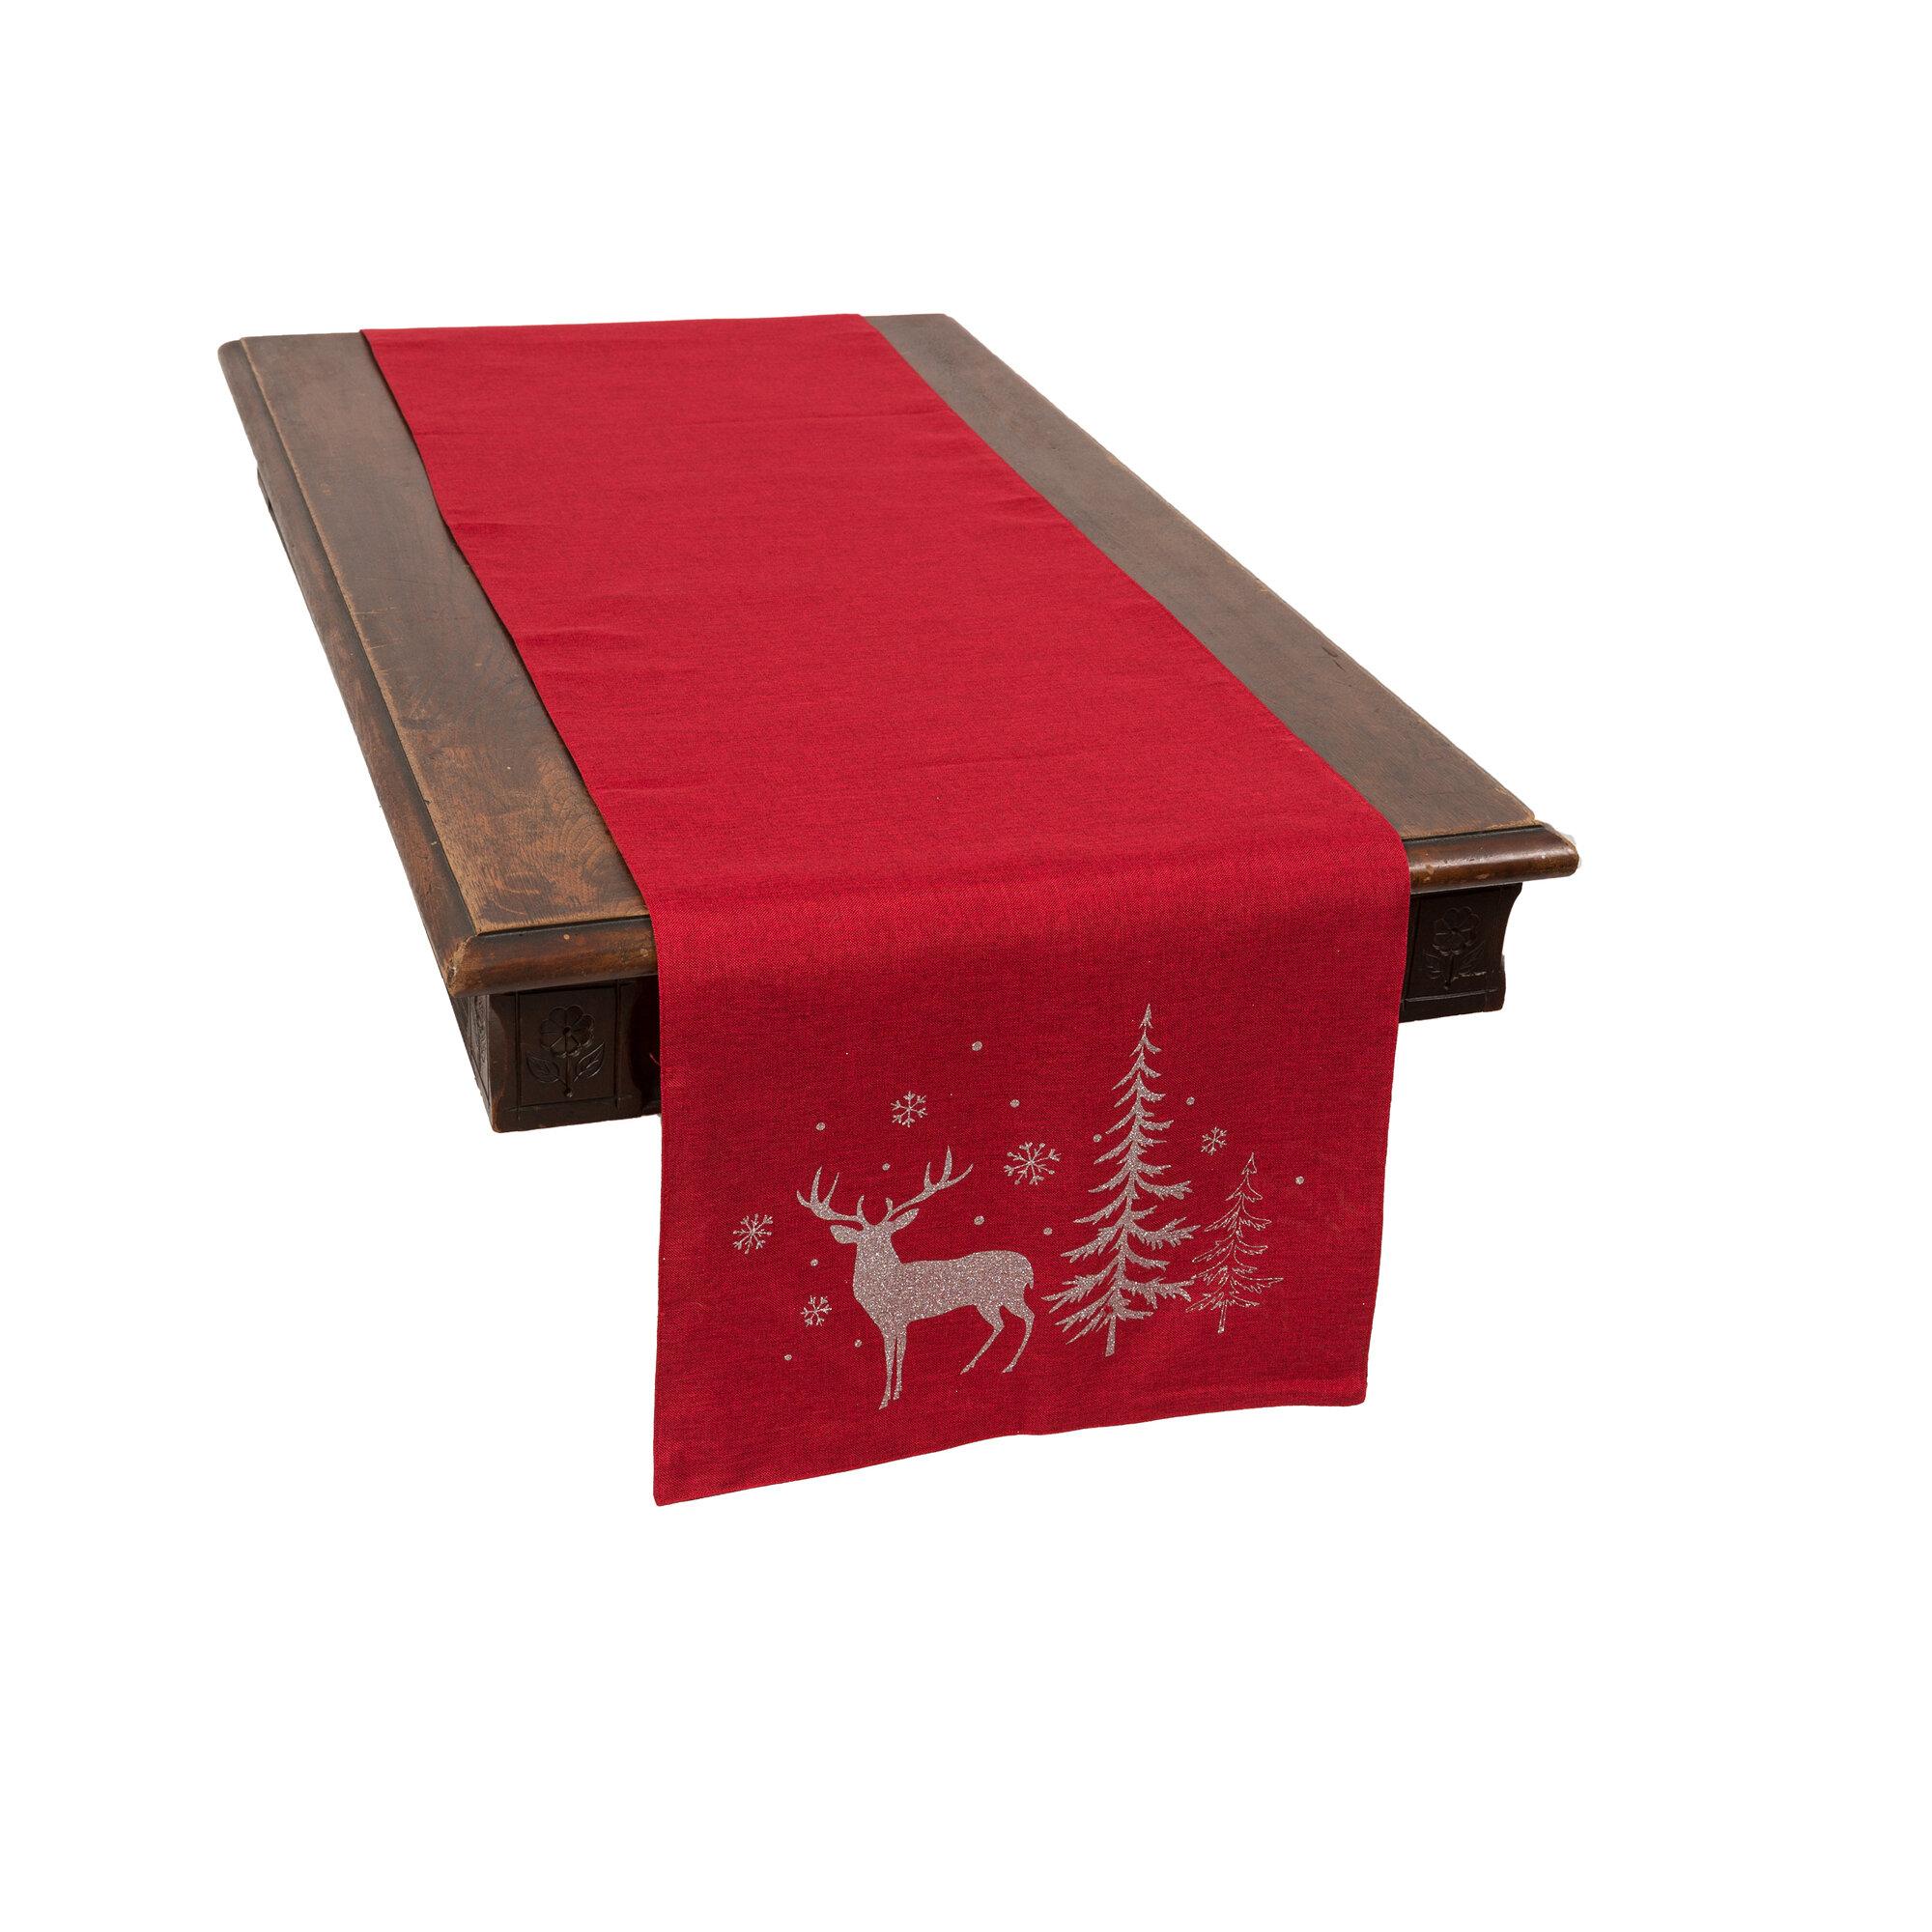 The Holiday Aisle Adlai Deer Table Runner Reviews Wayfair